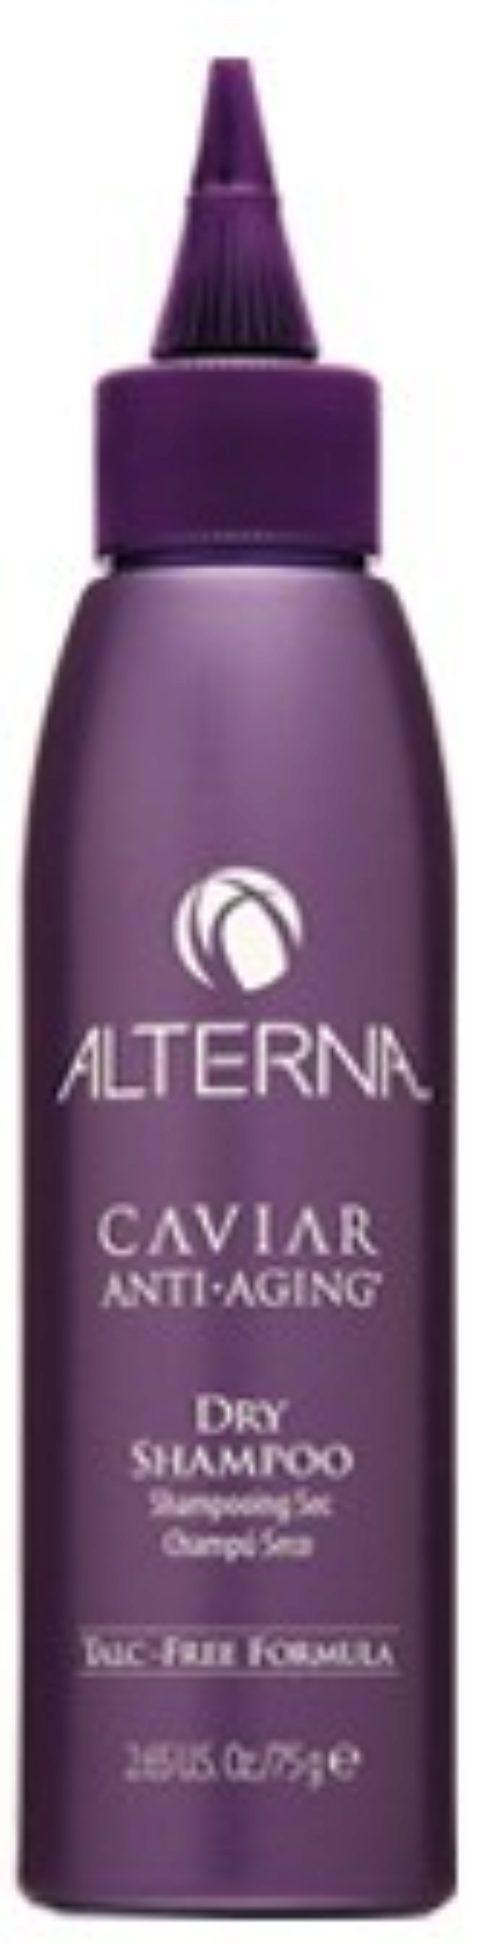 Alterna Caviar Anti aging Dry shampoo 75gr